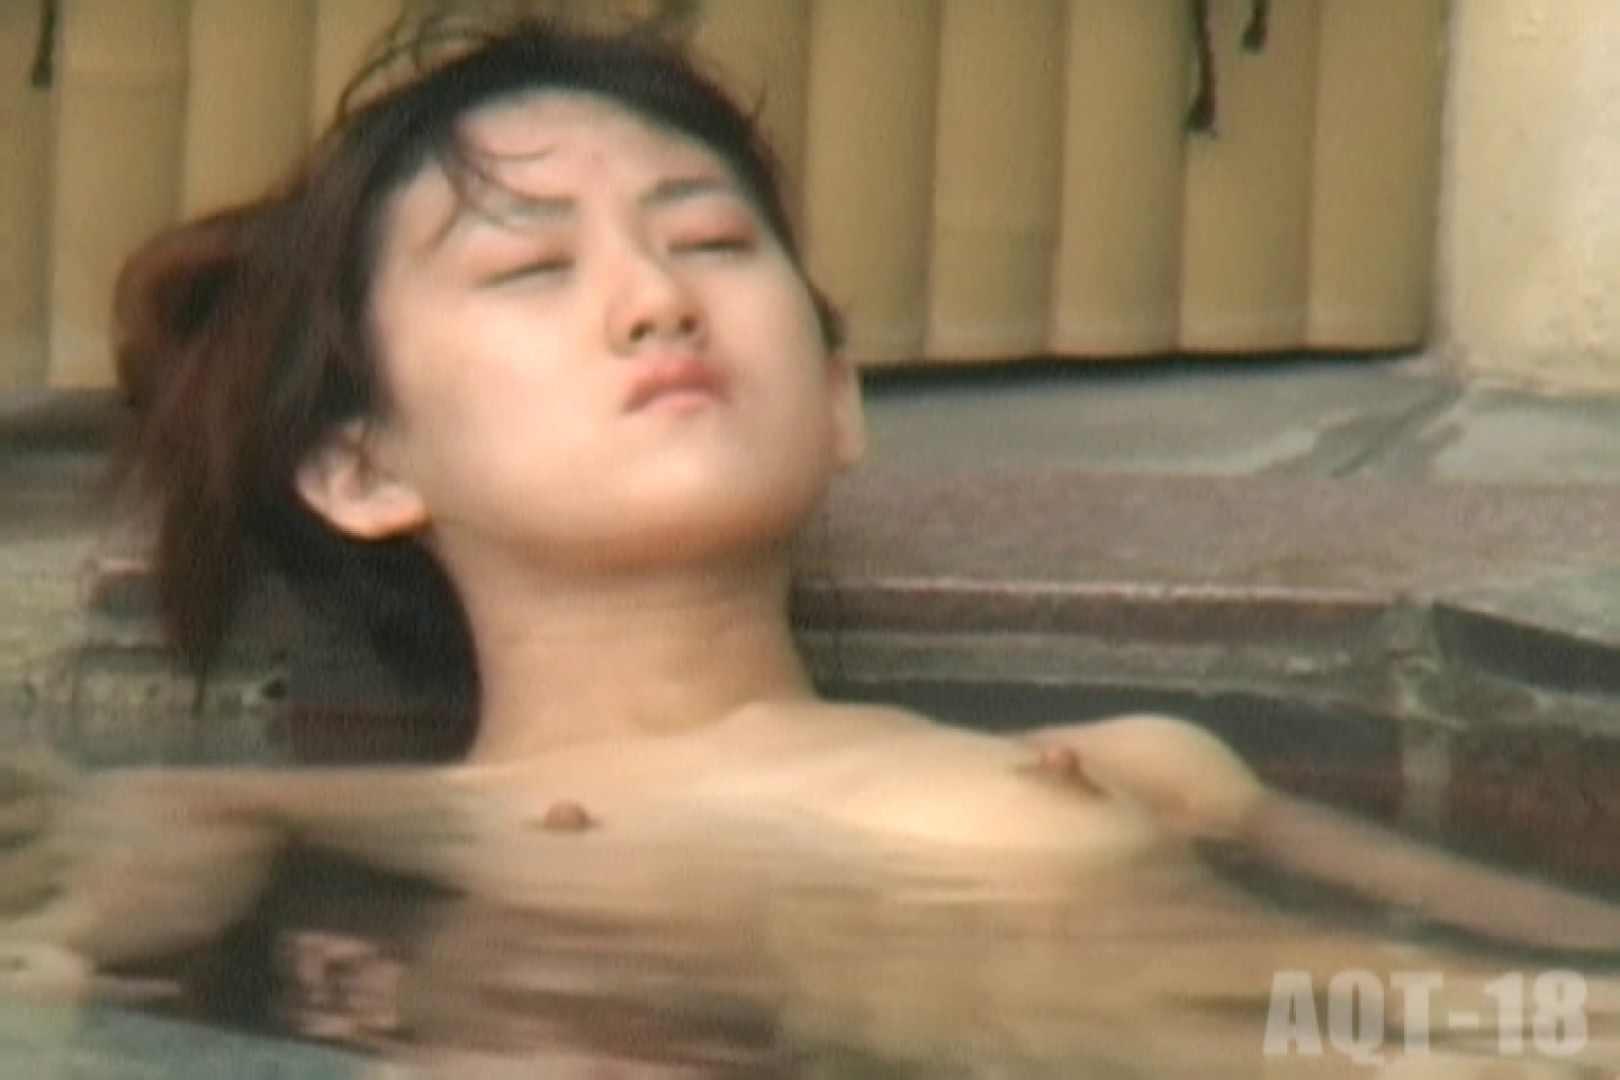 Aquaな露天風呂Vol.862 盗撮師作品  99pic 75